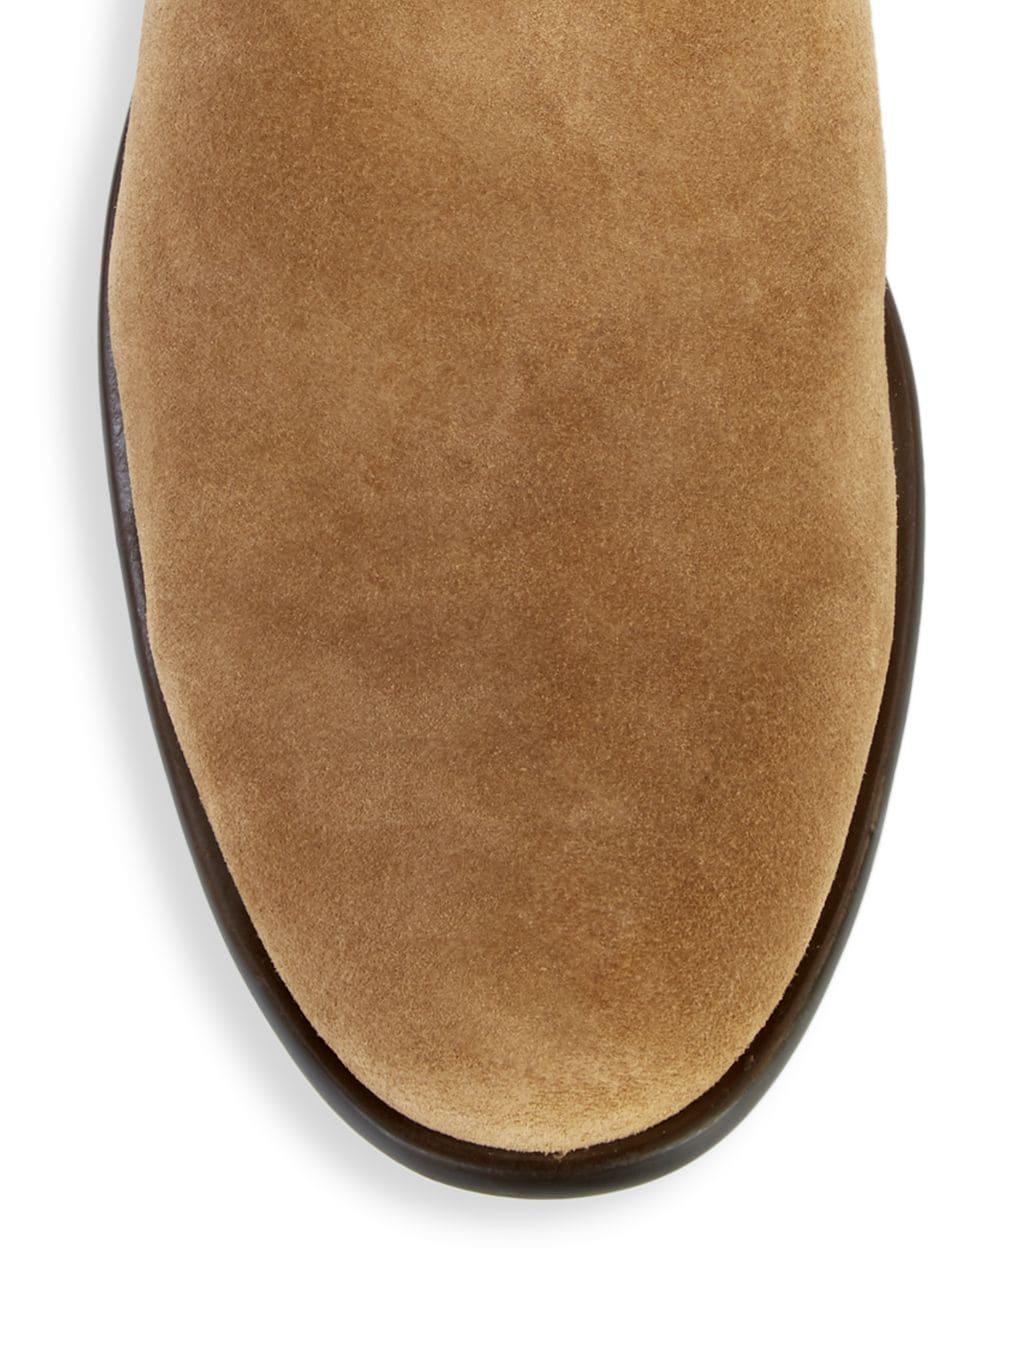 John Varvatos Star U.S.A. Suede Chelsea Boots